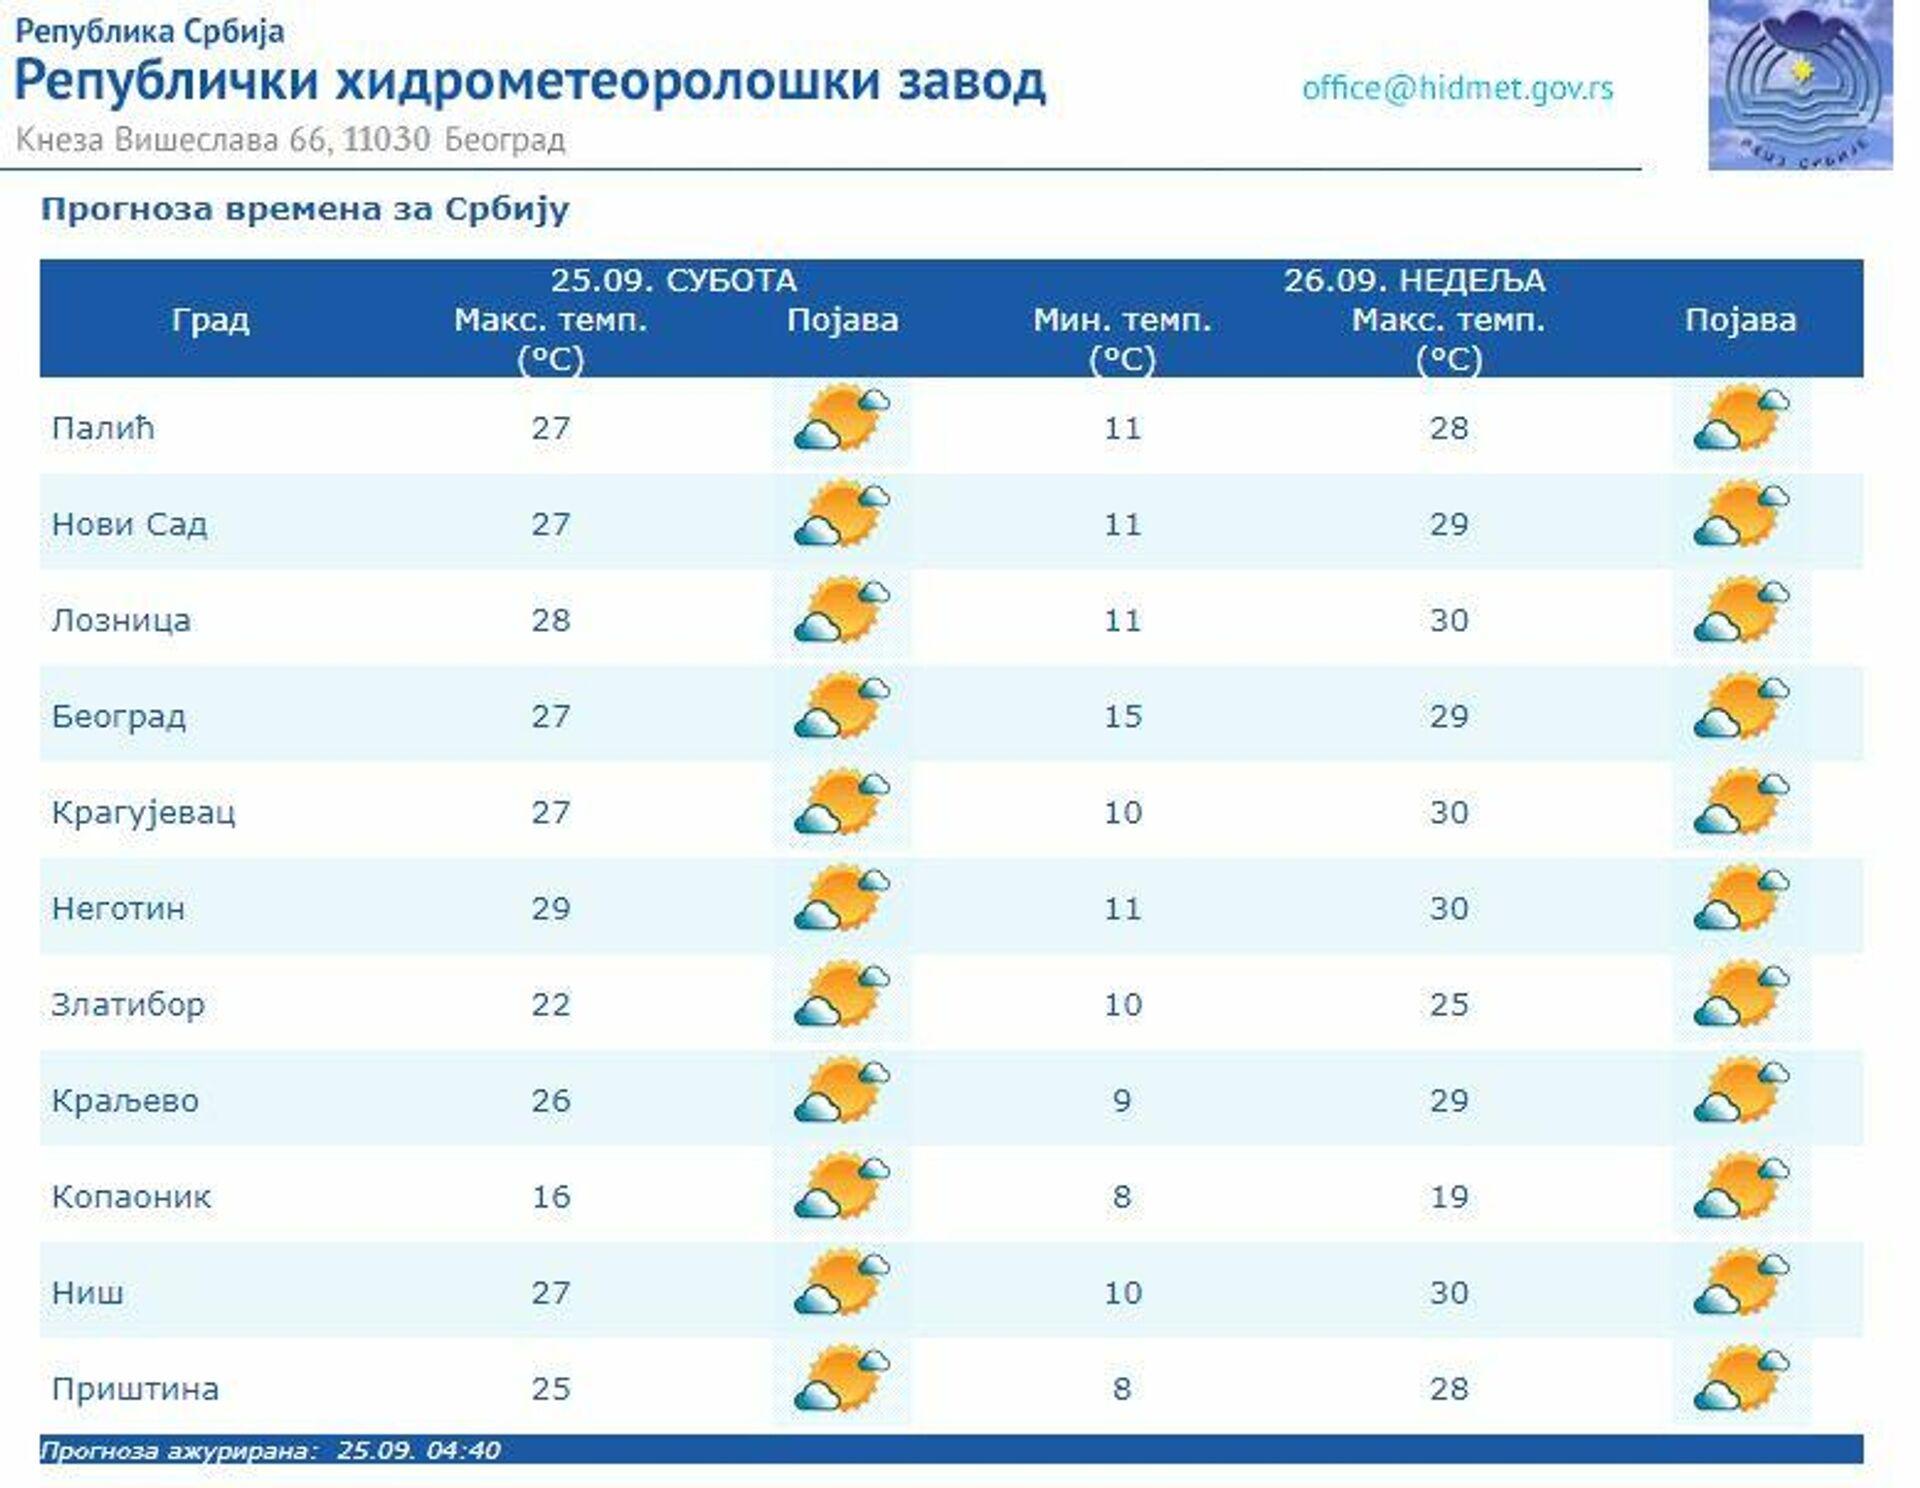 Vremenska prognoza za 25. septembar 2021. - Sputnik Srbija, 1920, 25.09.2021